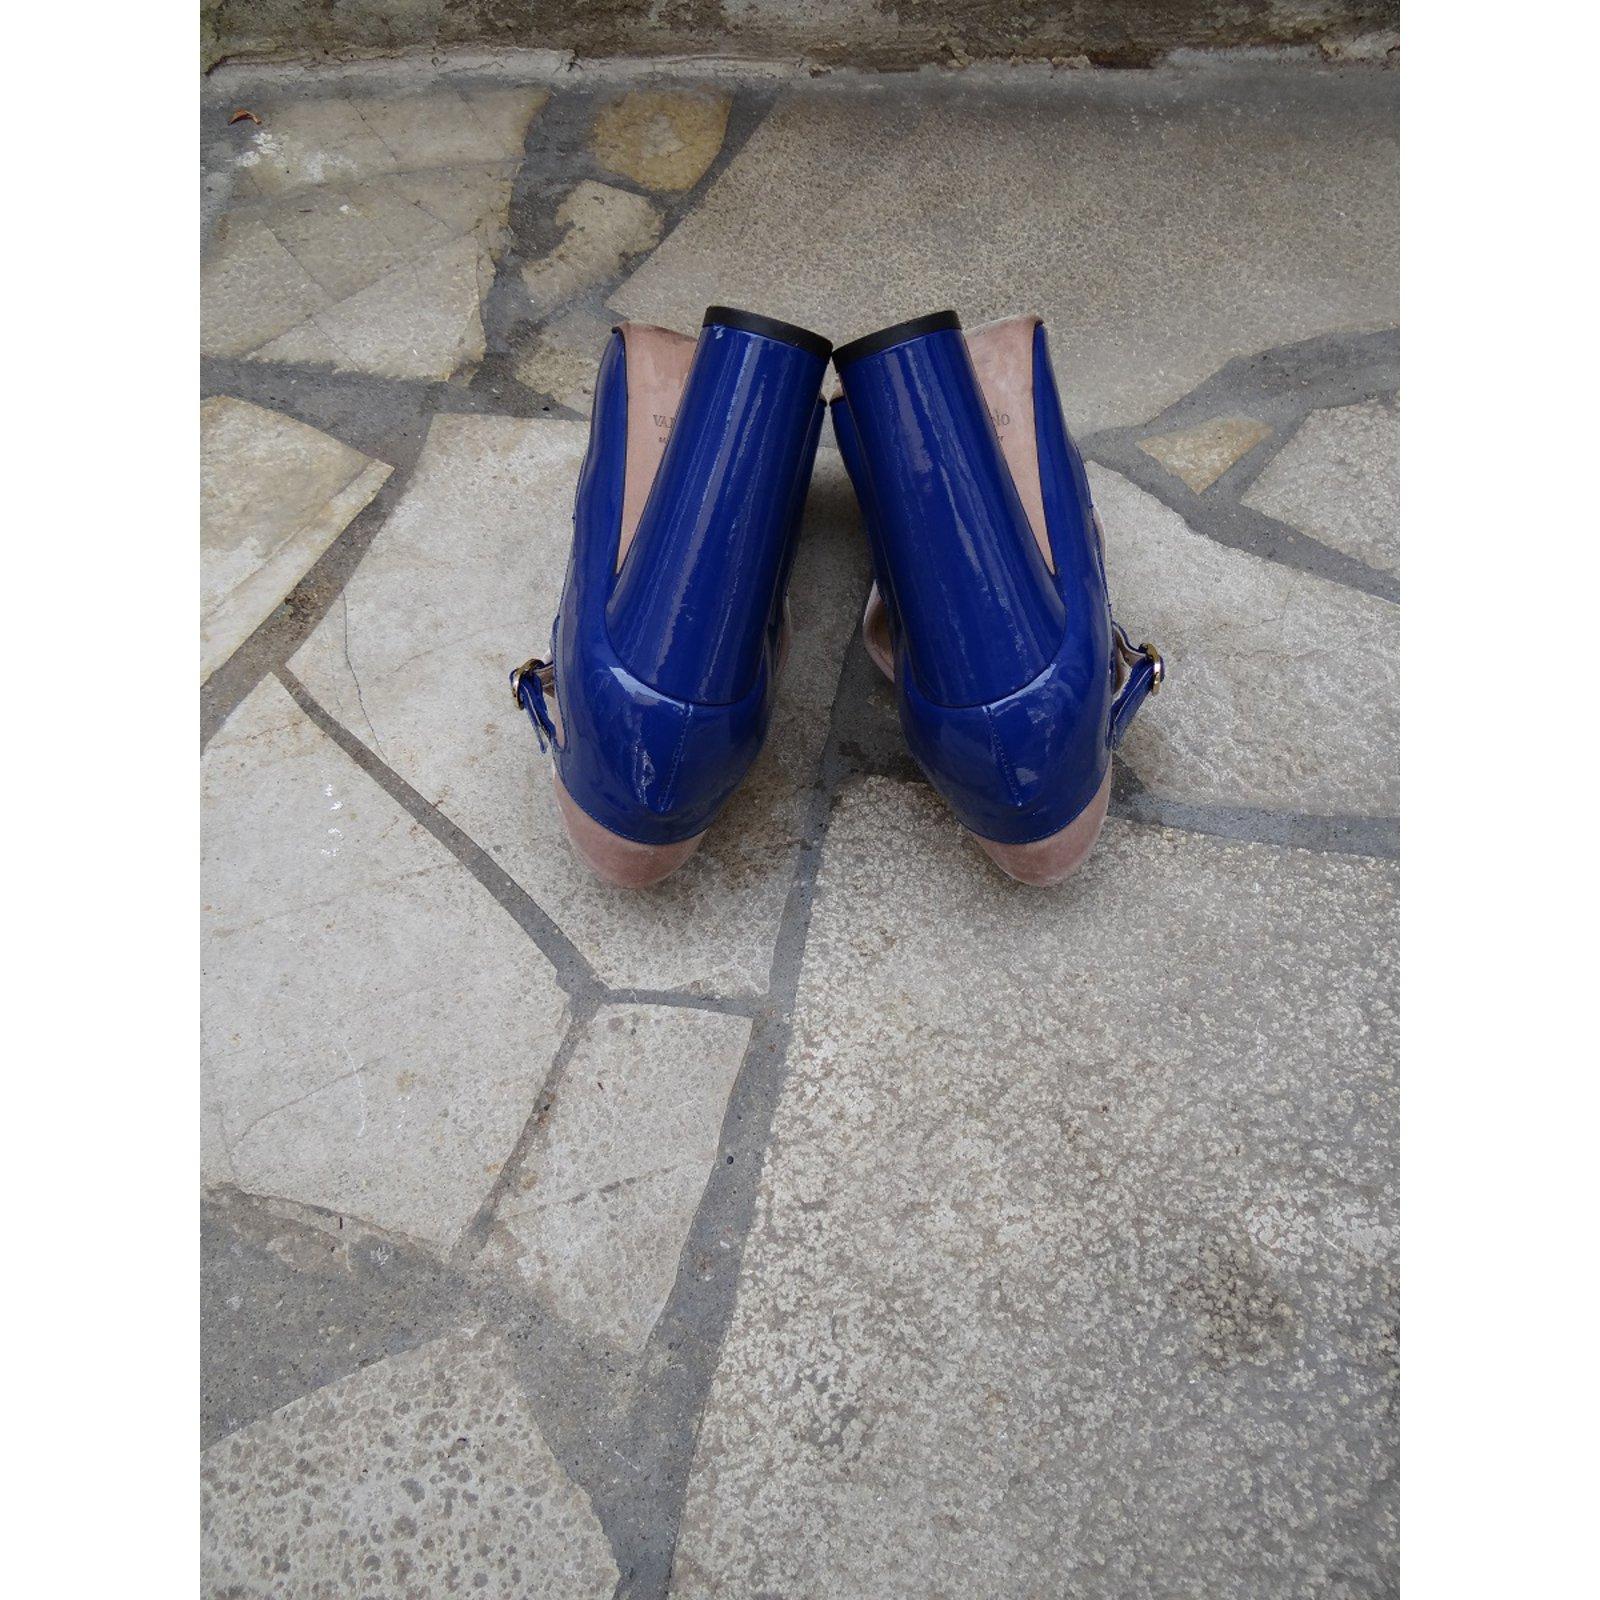 Valentino Pumps Heels VelvetPatent Leather PinkBlue Ref67697